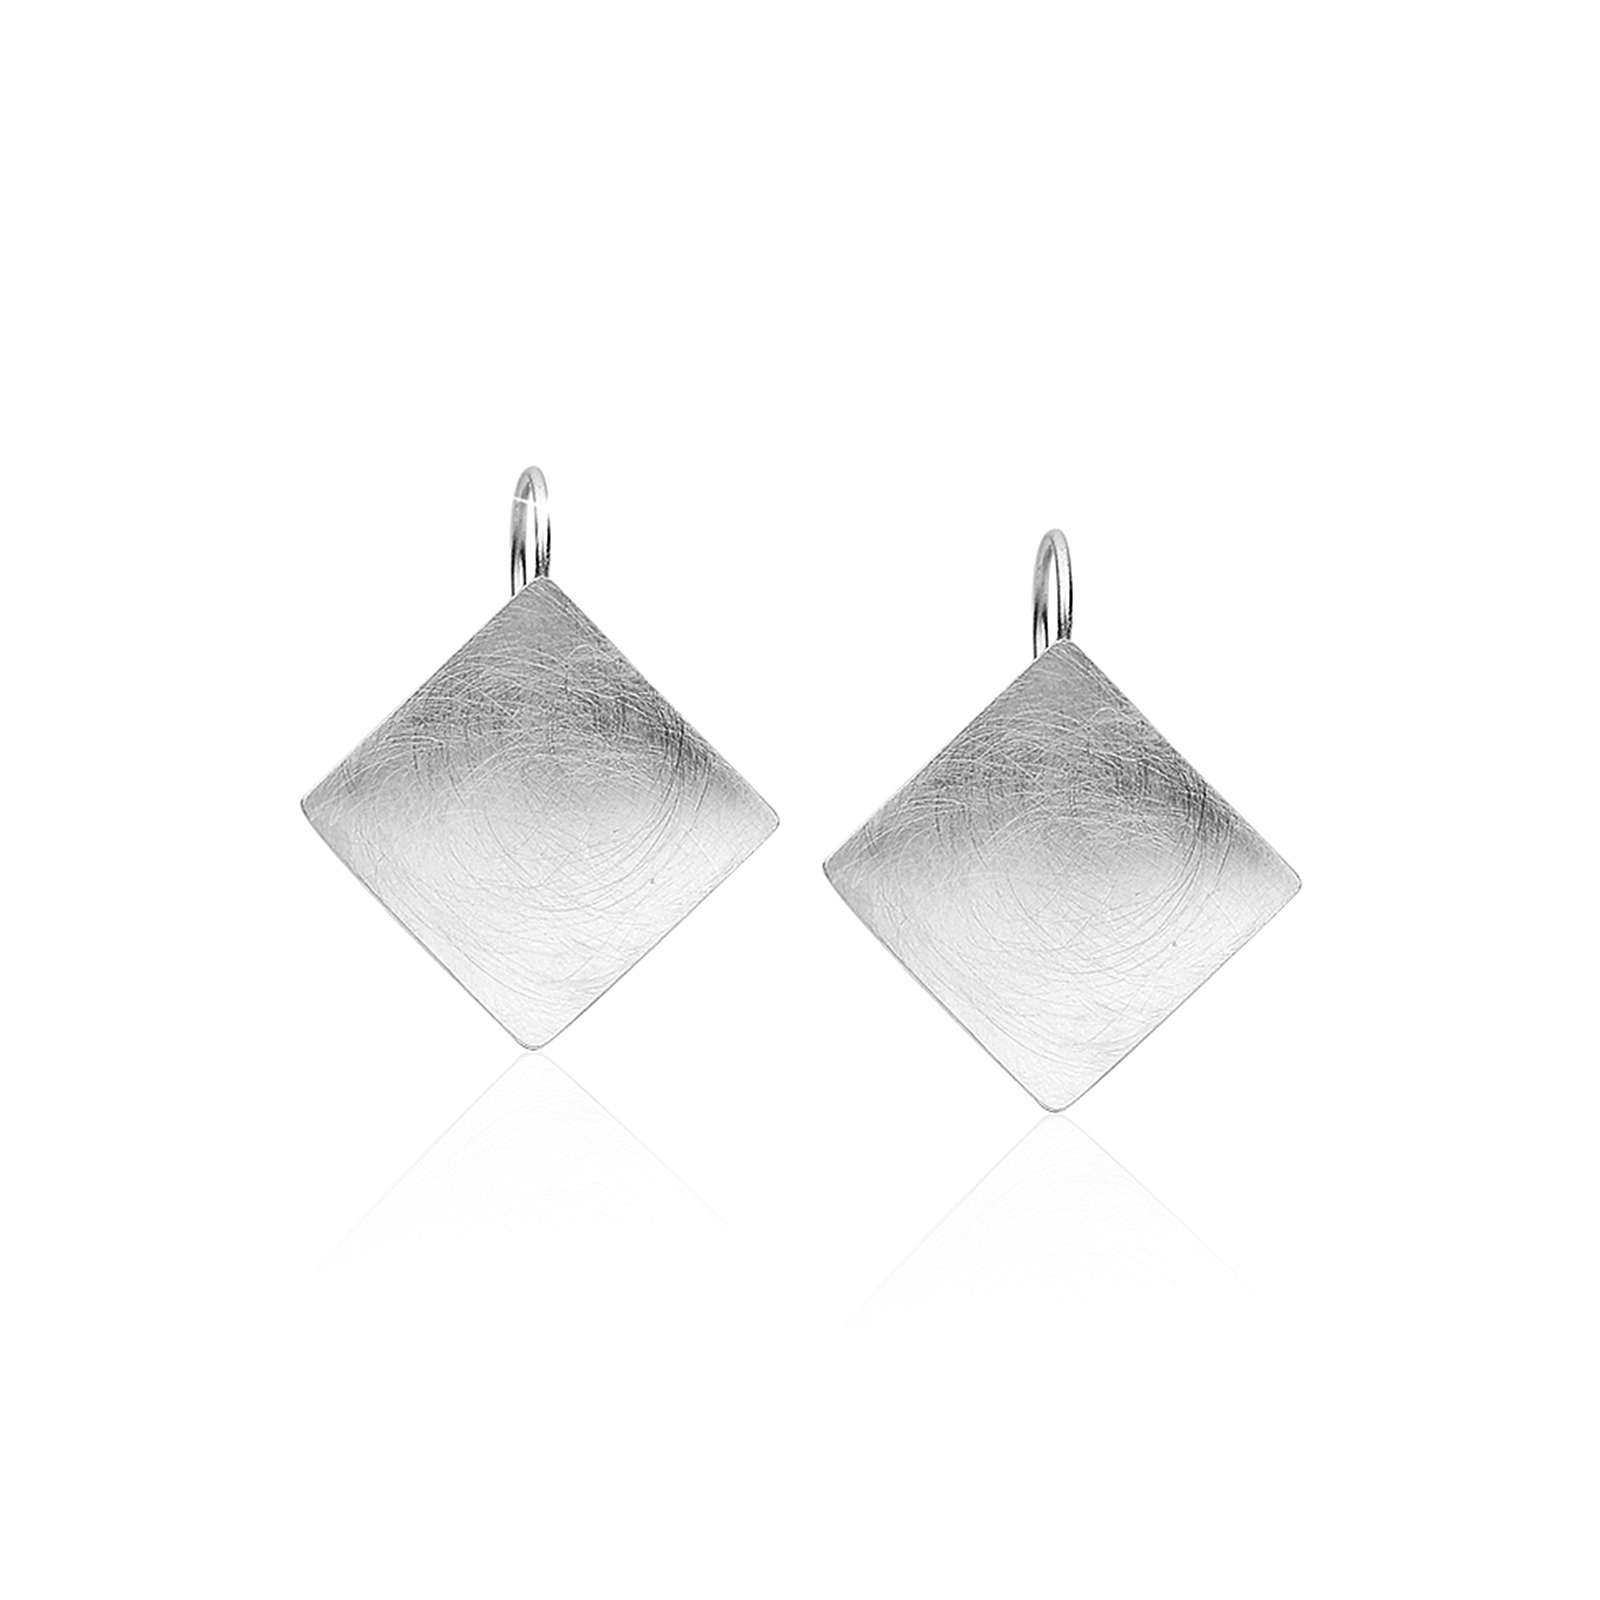 Nenalina Ohrringe Basic Geo Viereck Brushed Trend 925 Silber Ohrhänger silber Damen